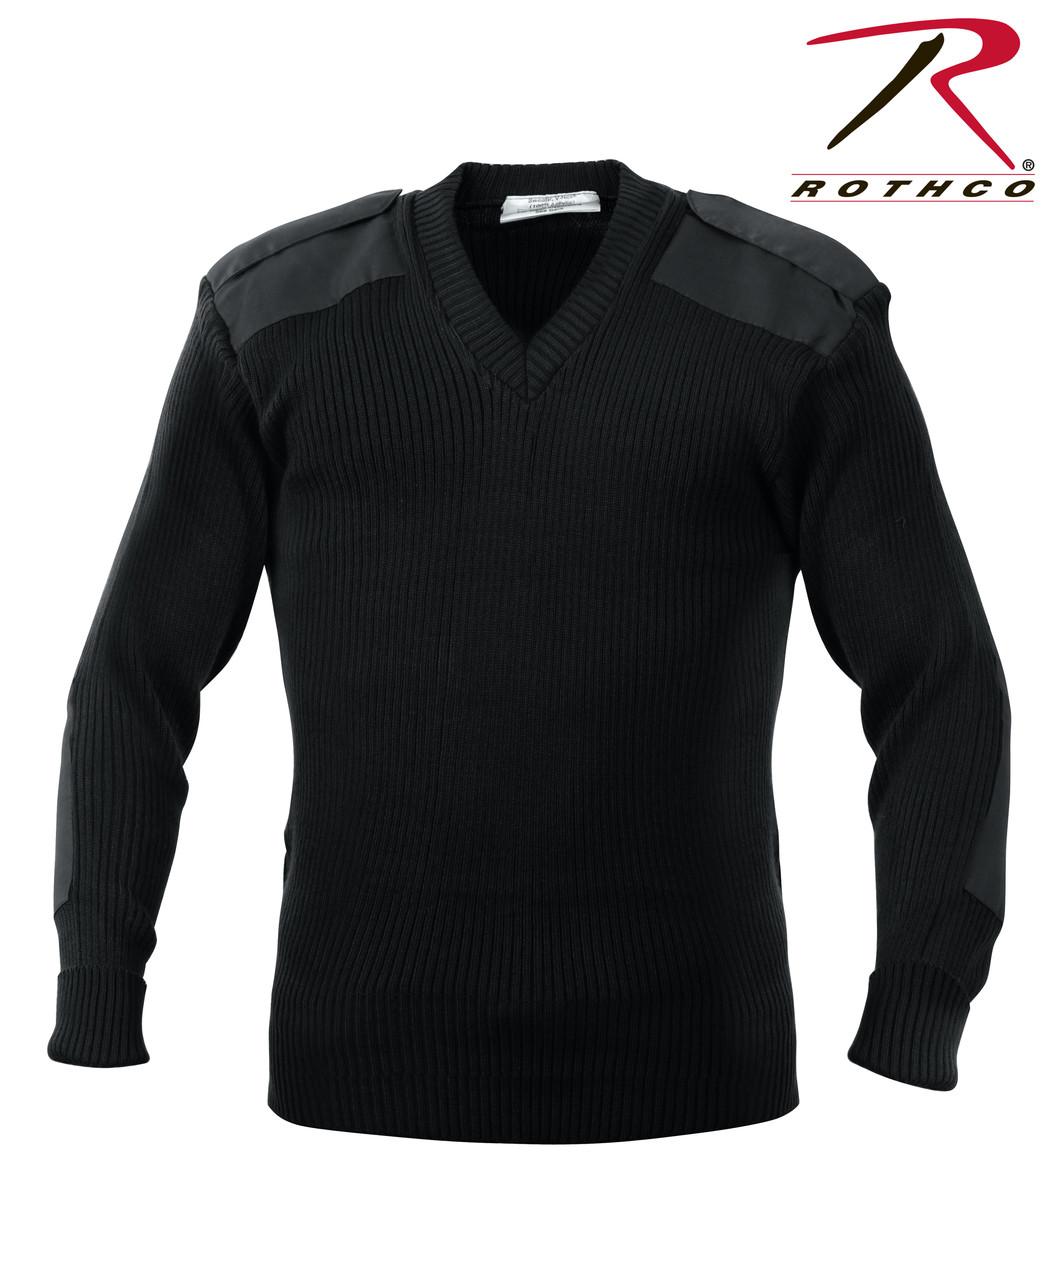 Acrylic Aviation Sweater